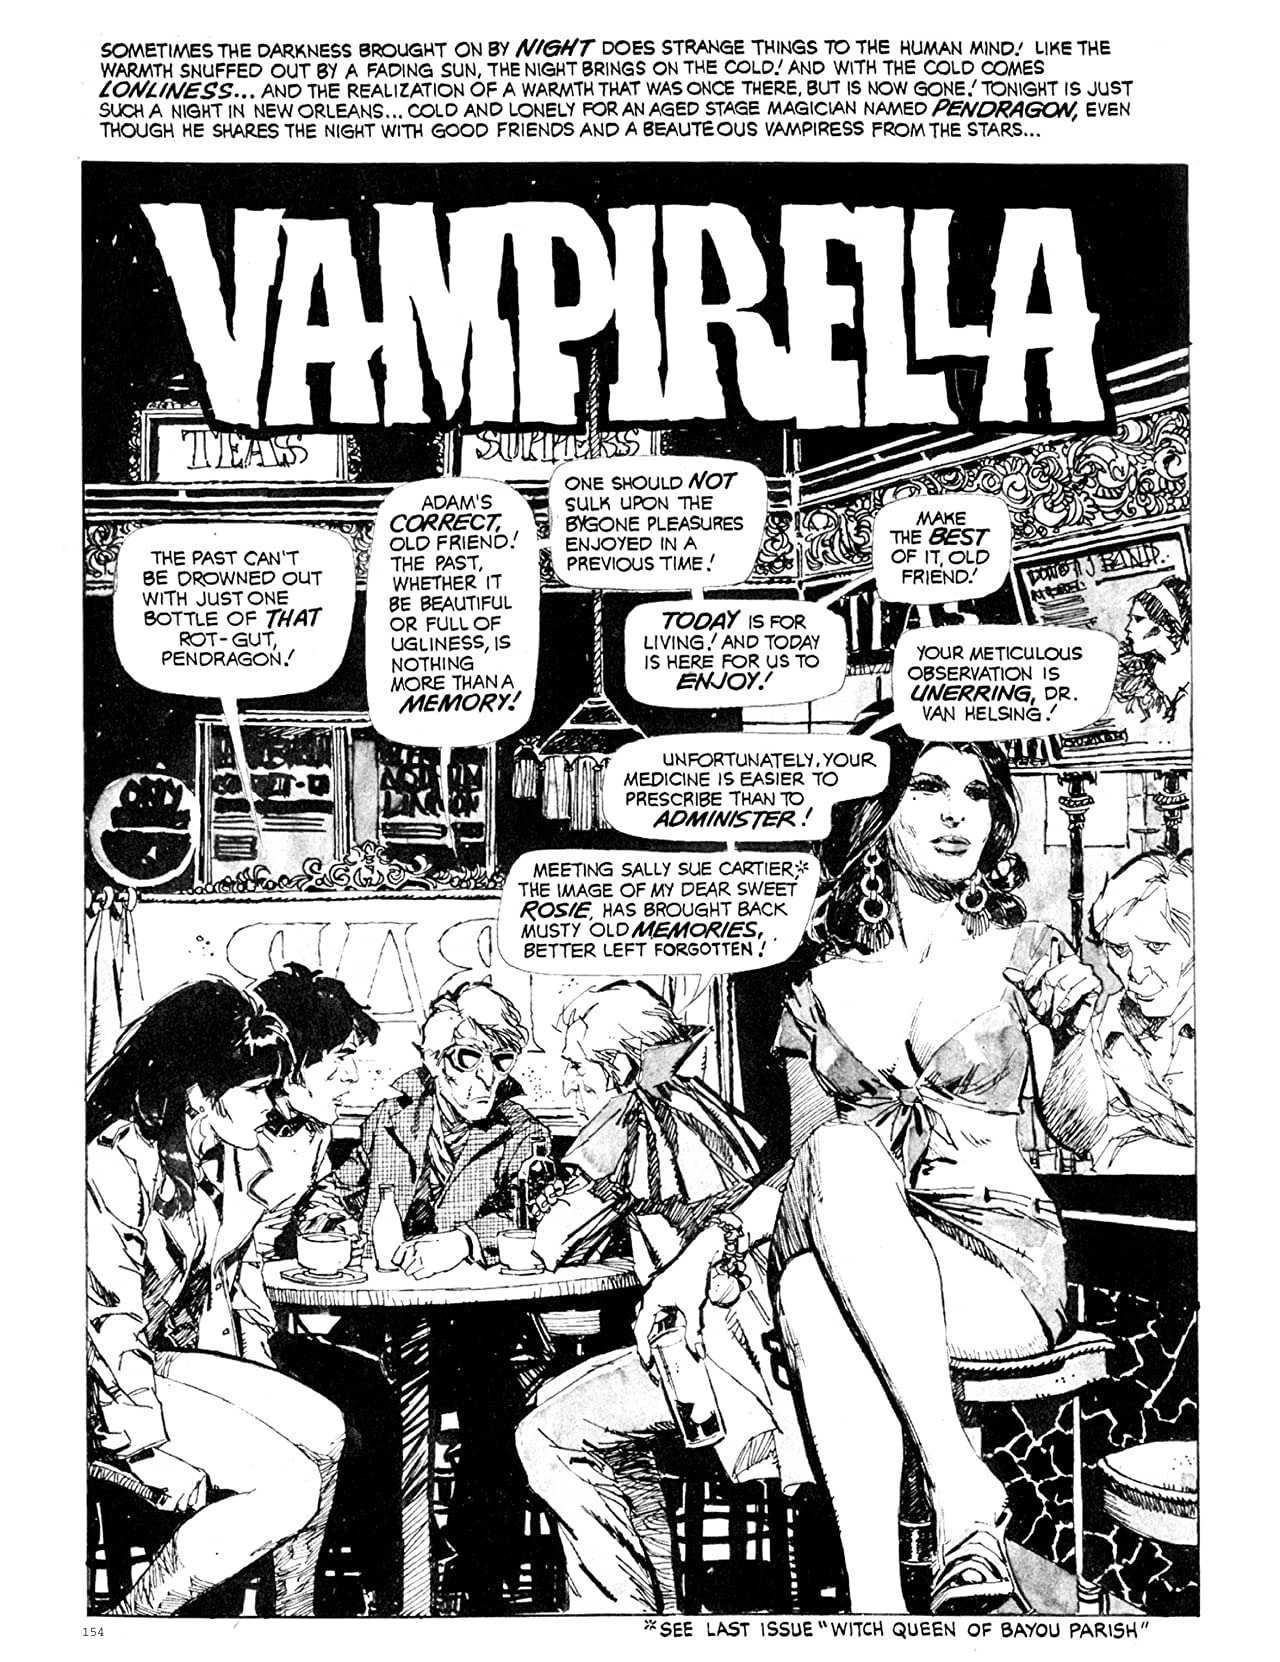 Vampirella (Magazine 1969-1983) #24